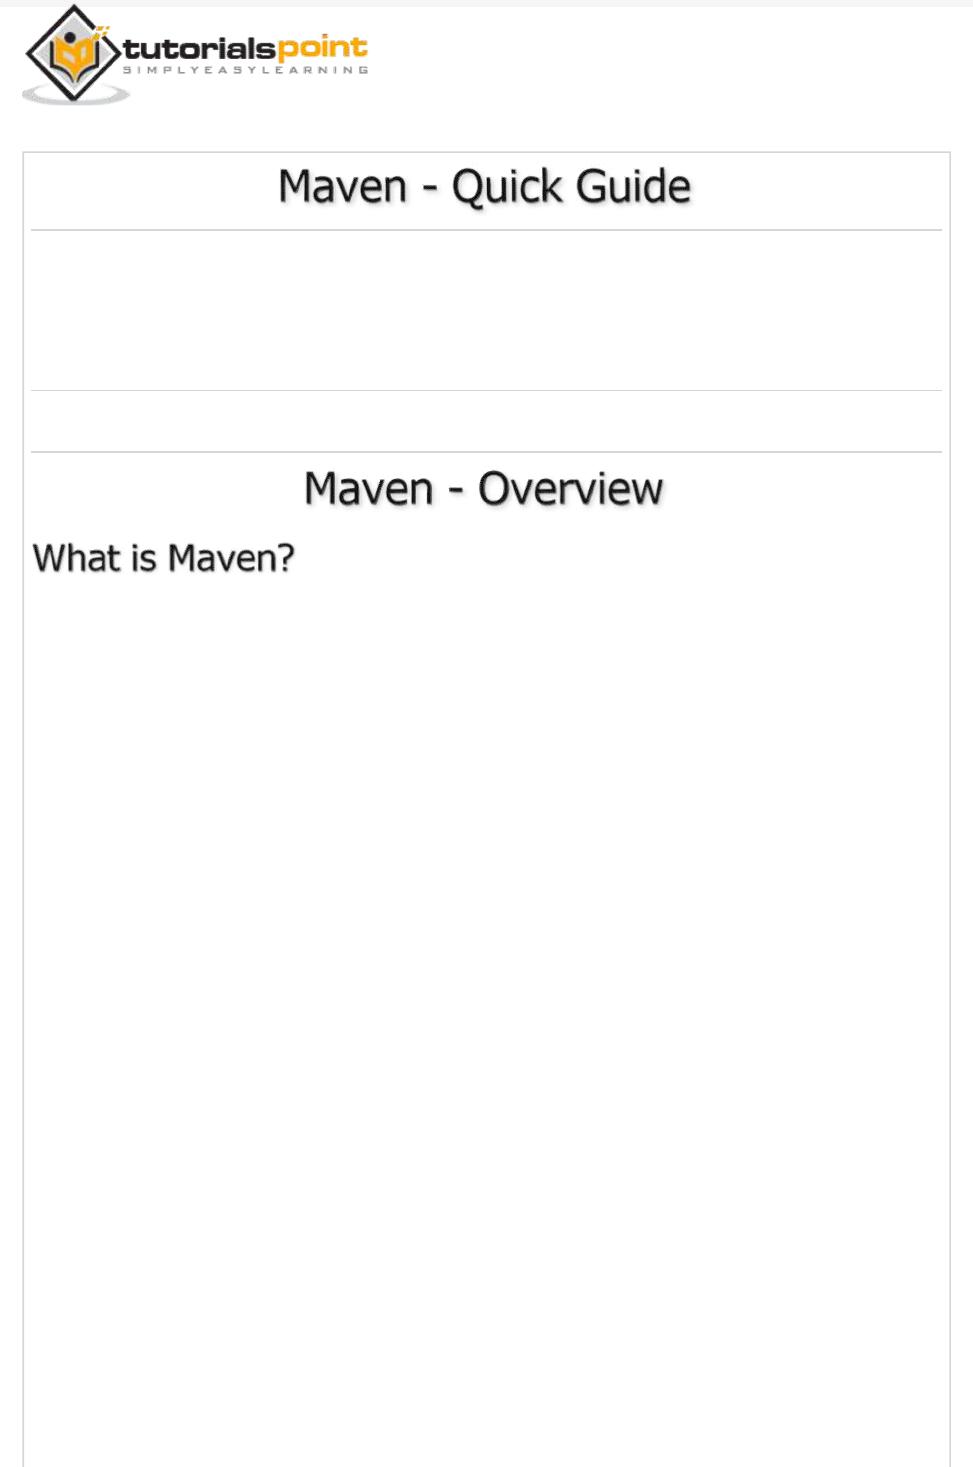 Maven Quick Guide Tutorialspoint